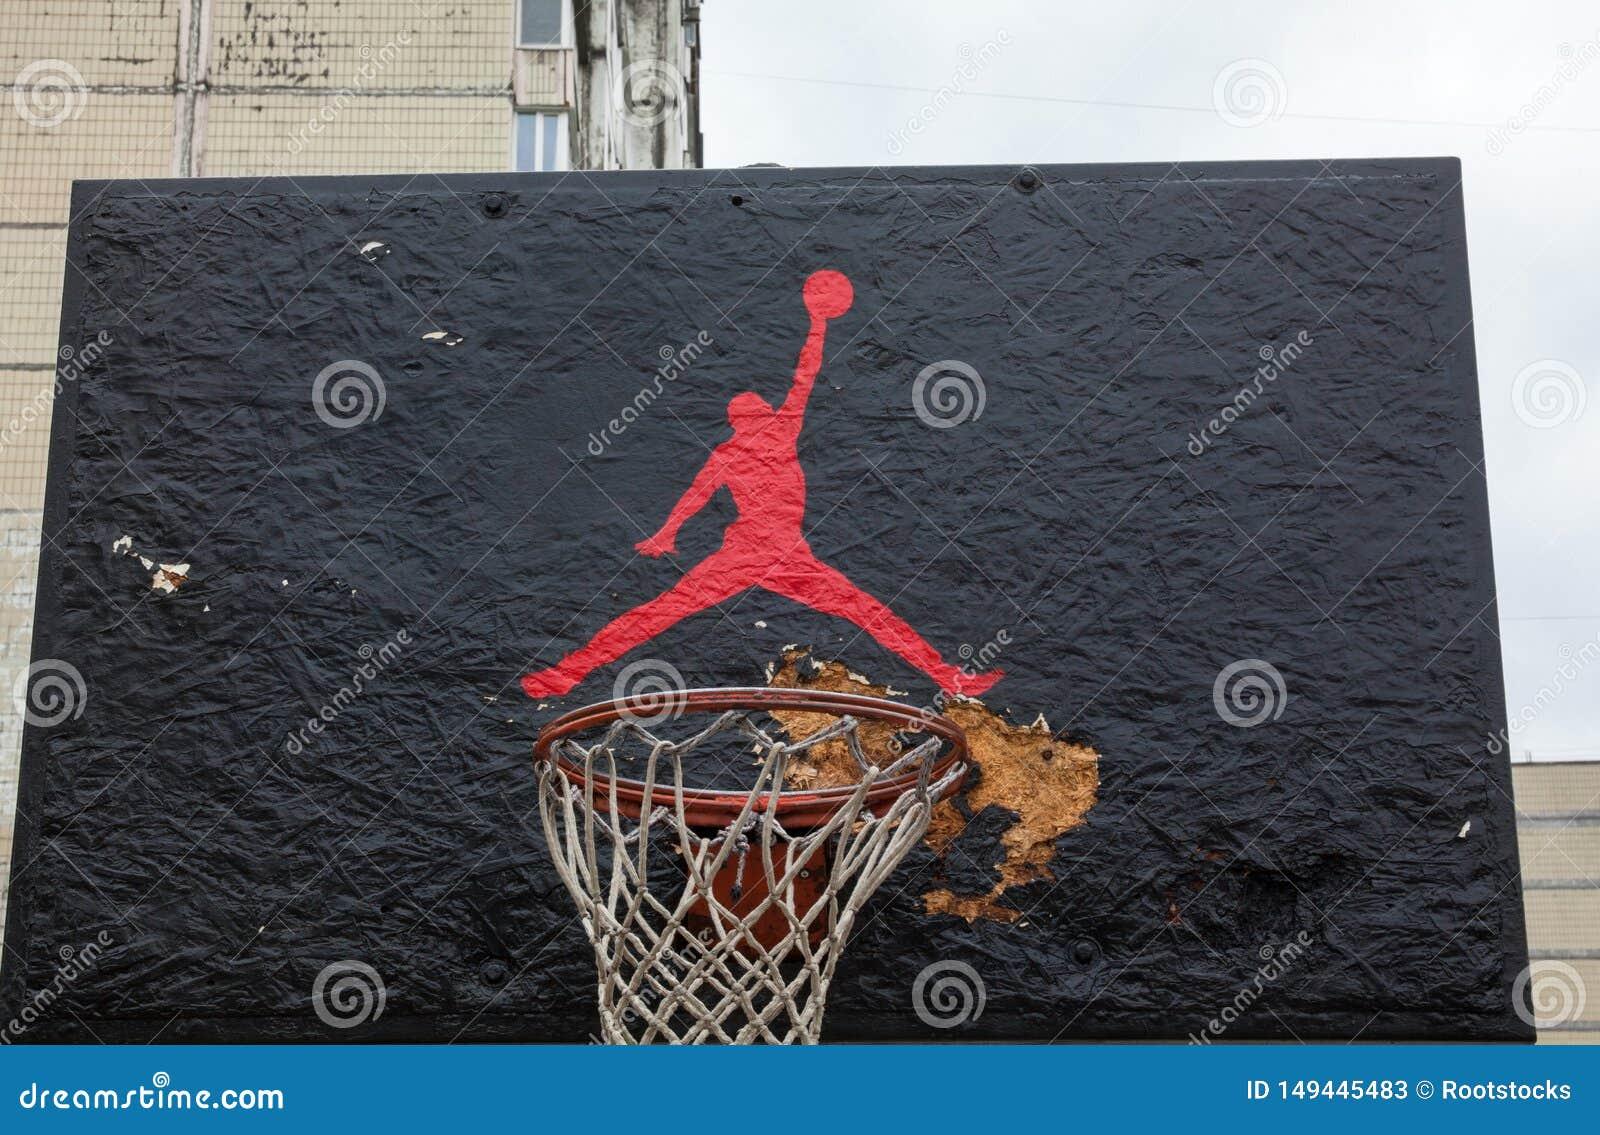 économiser 9a591 ca1ba Jumpman Logo By Nike On The Basketball Backboard Editorial ...